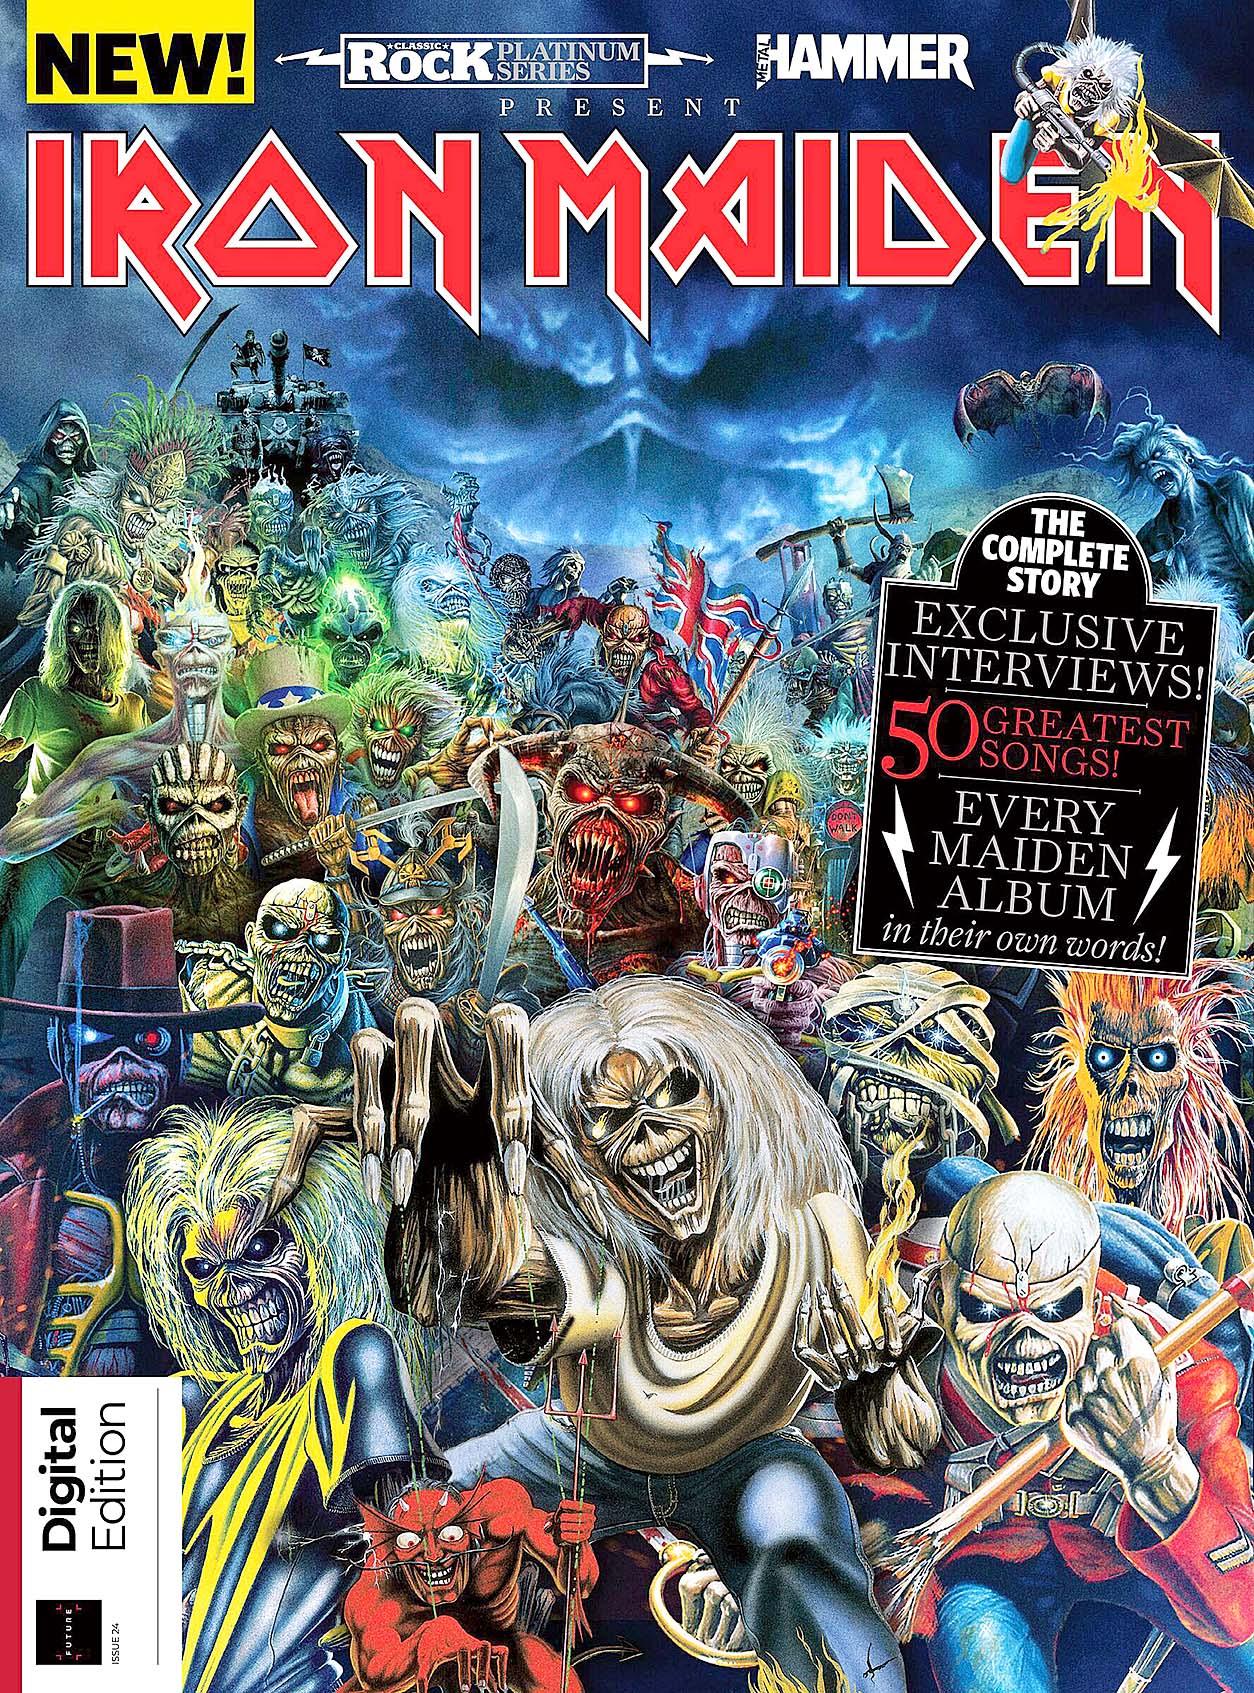 Classic Rock Sp Iron Maiden 2021.jpg